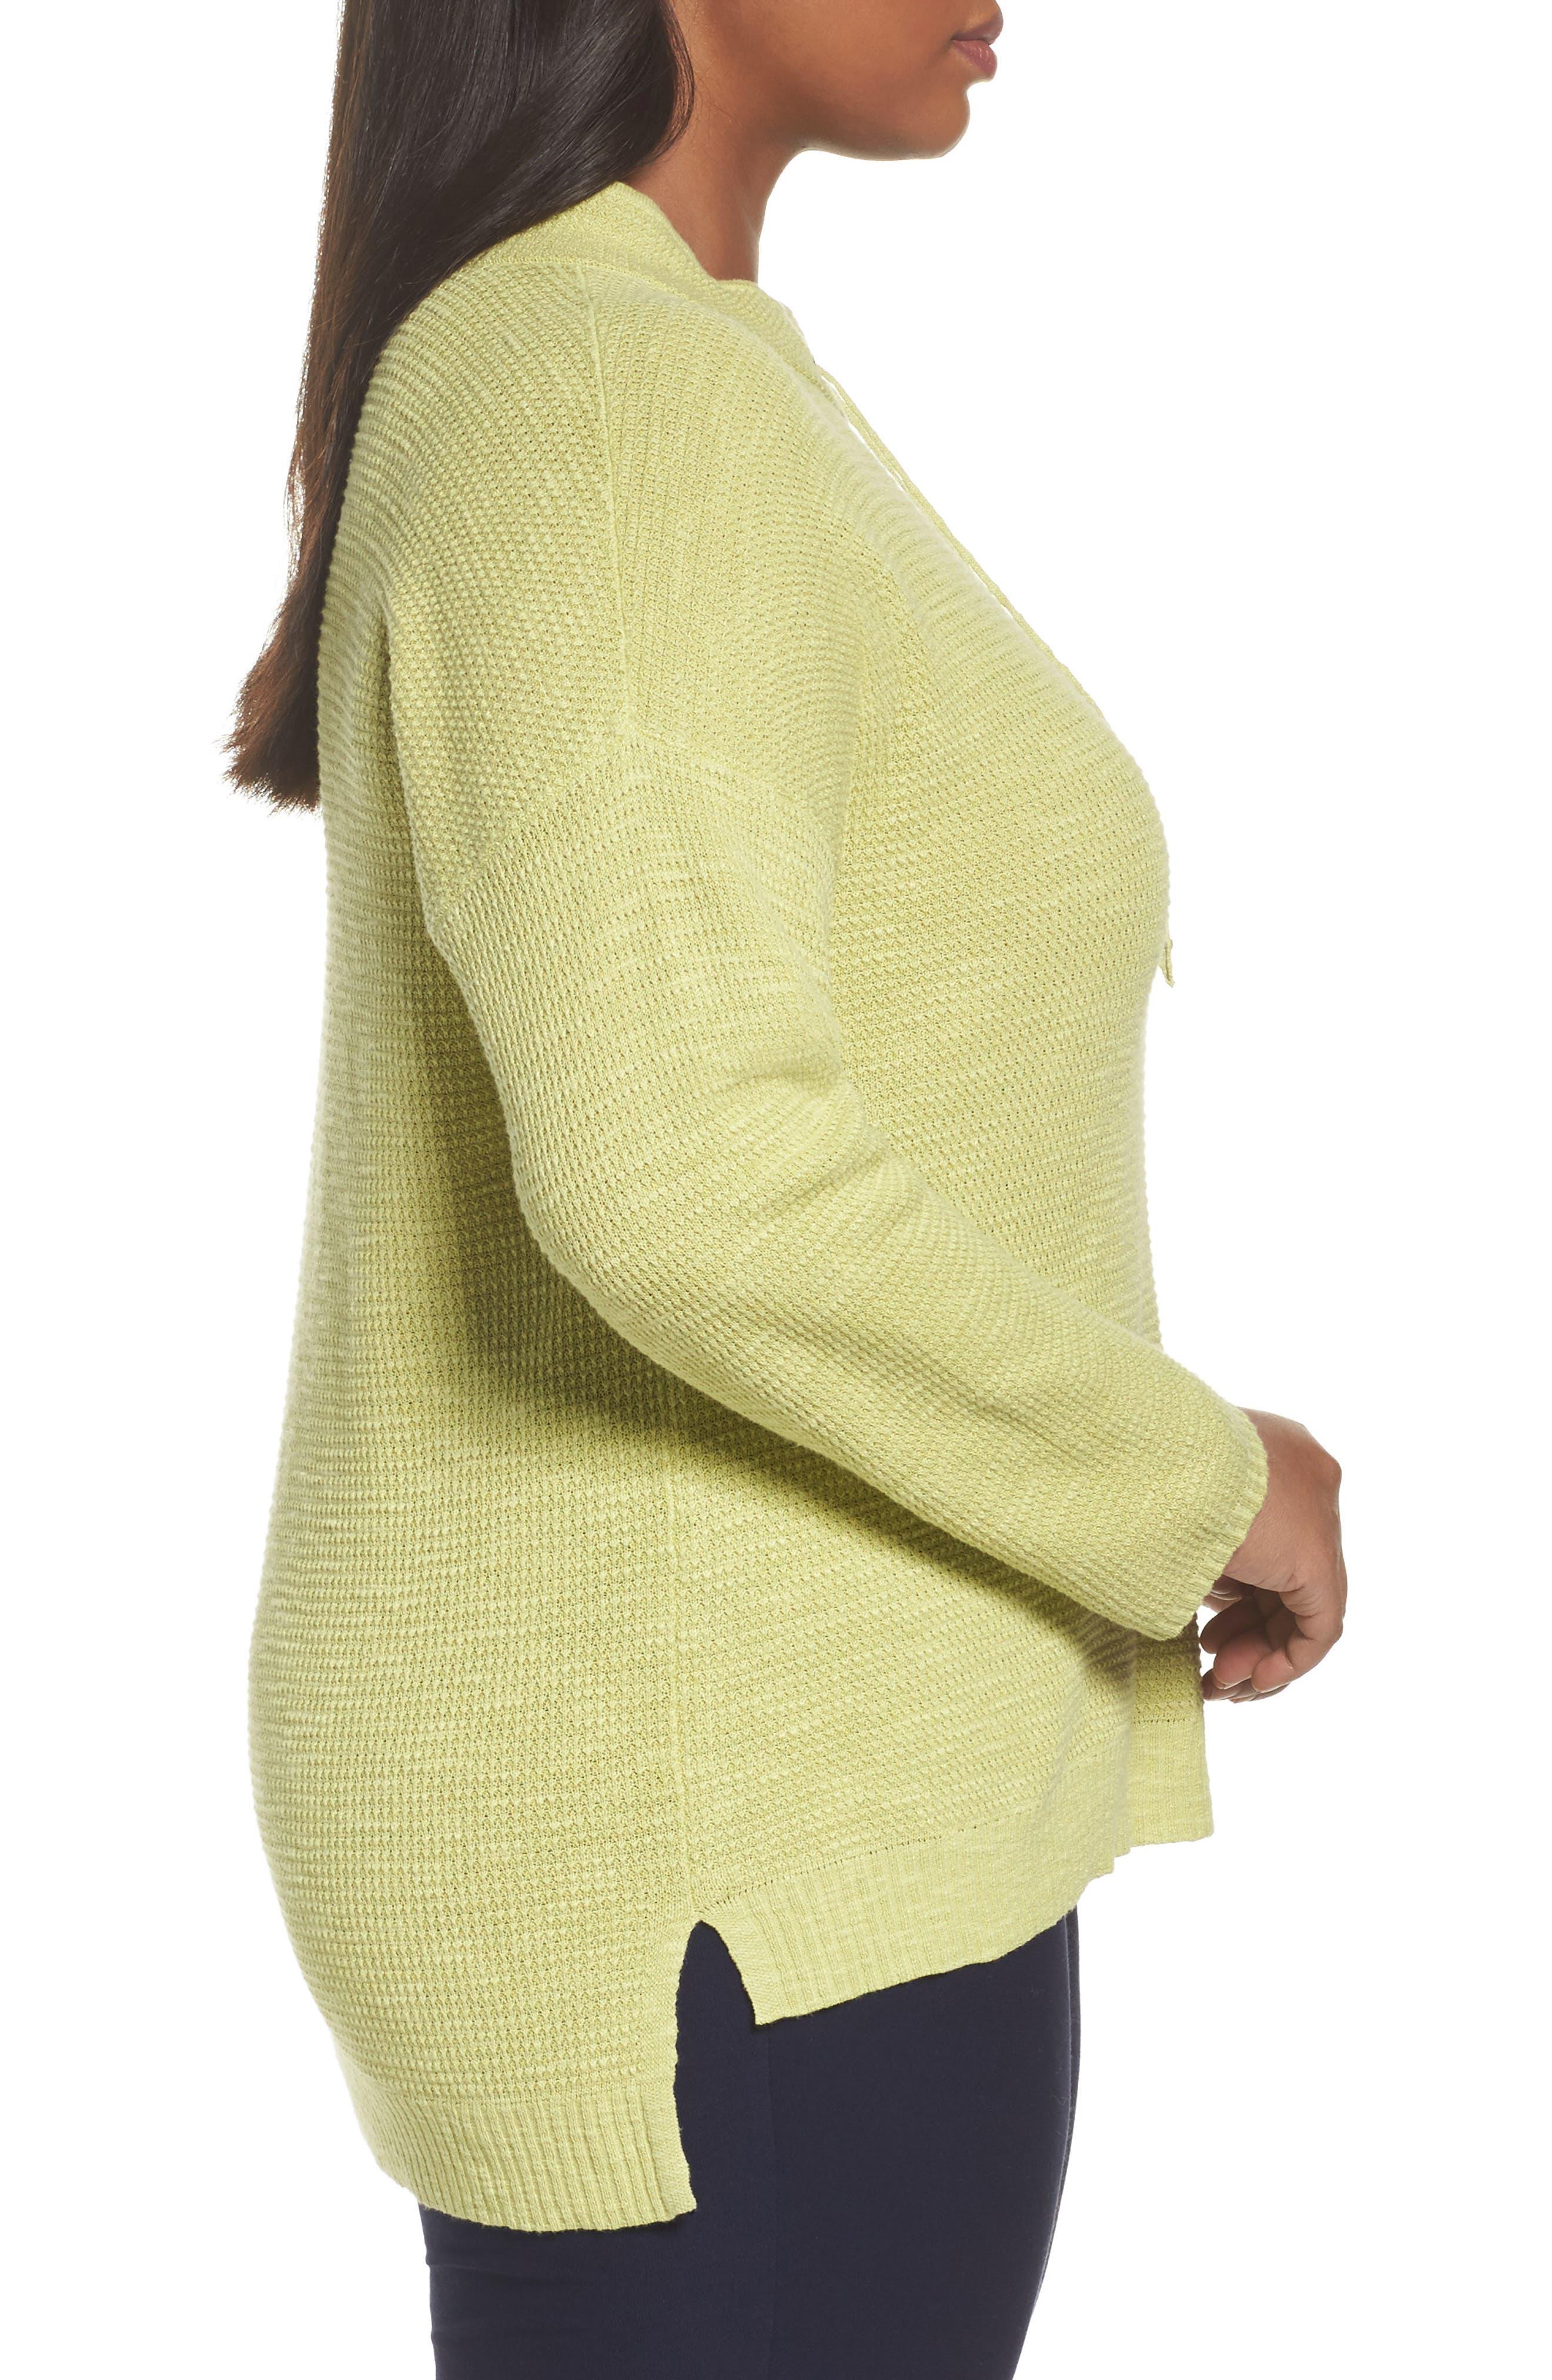 Alternate Image 3  - Eileen Fisher Drawstring Neck Organic Linen & Cotton Top (Plus Size)